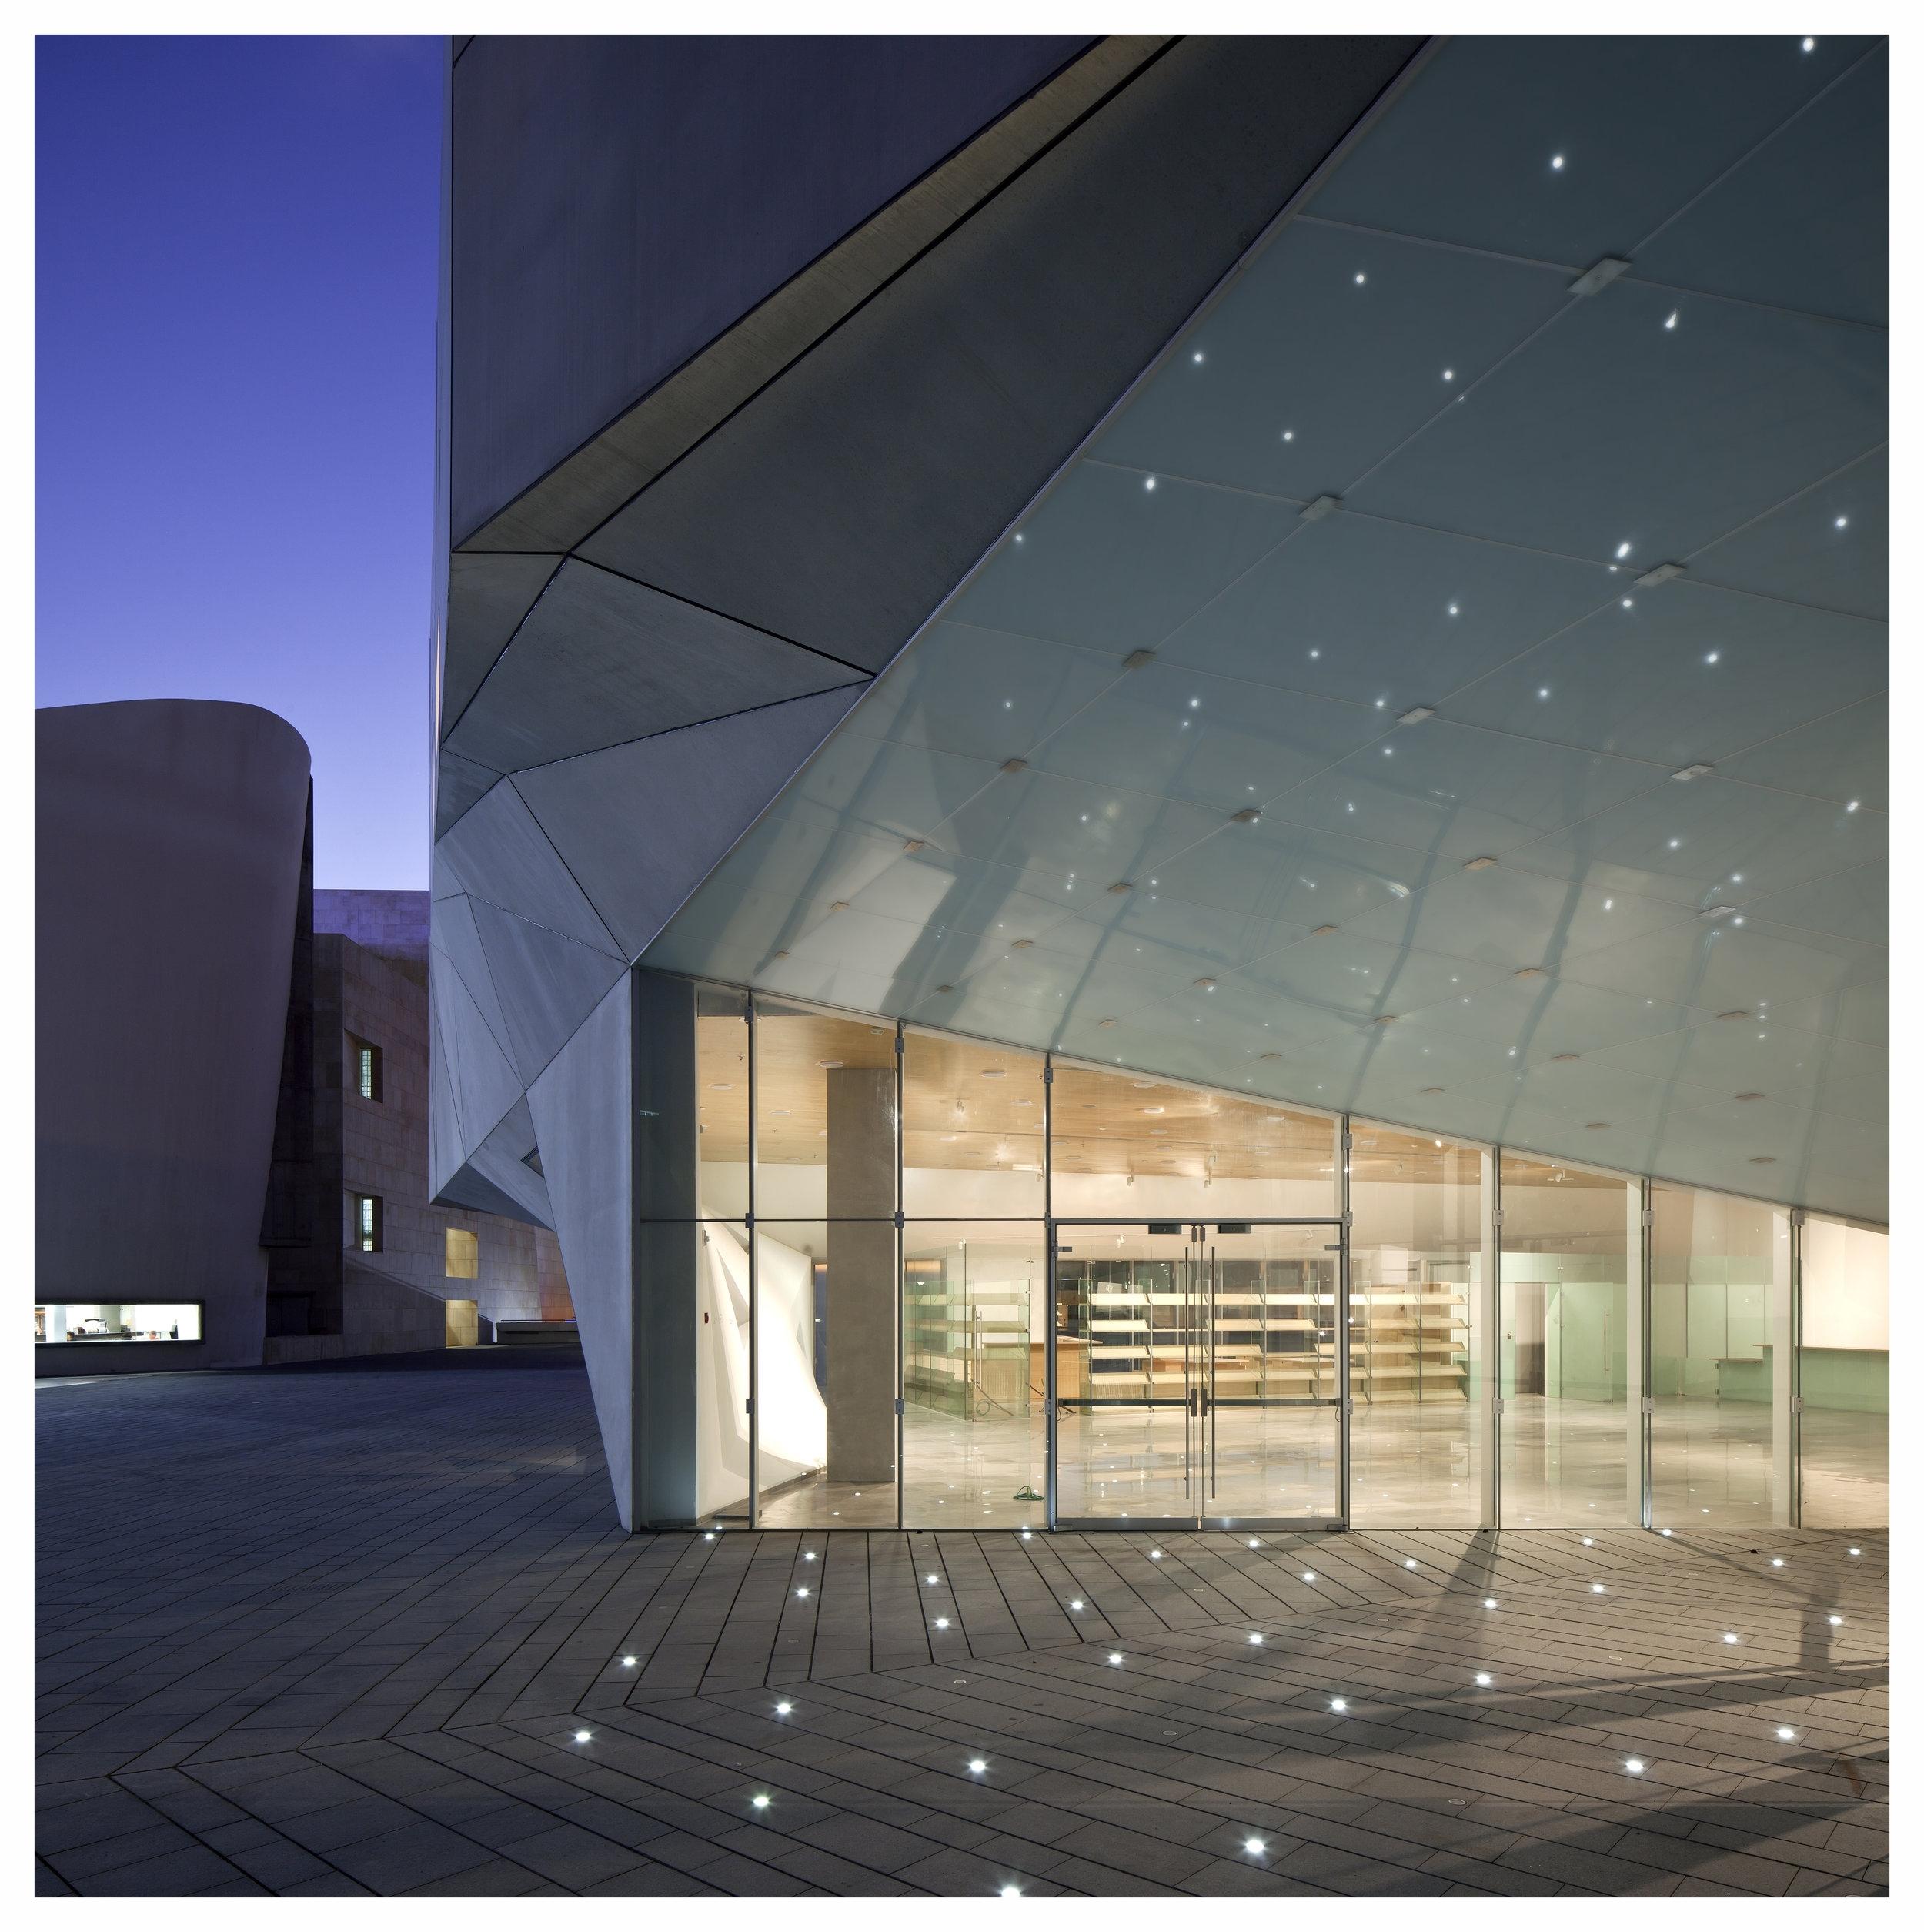 AMIT_GERON_TLV_MUSEUM_061_updated.jpg